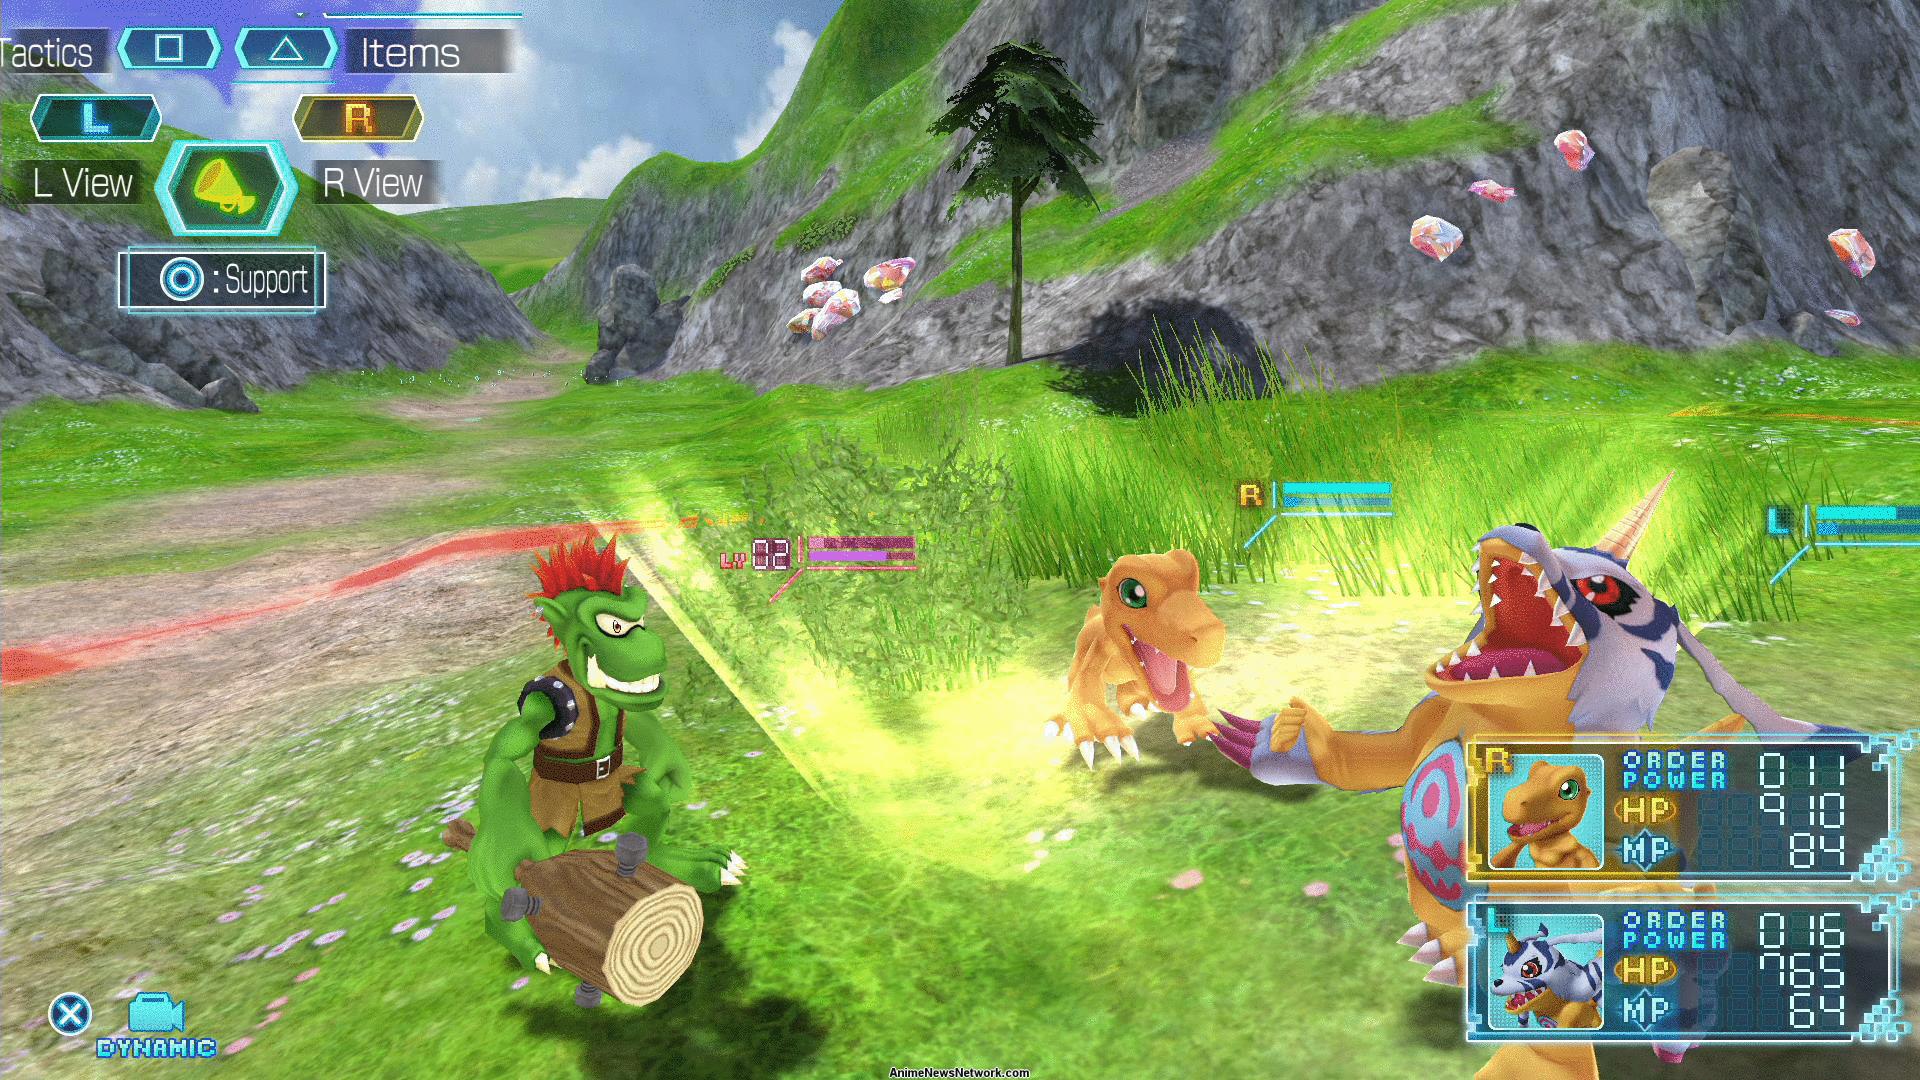 Digimon world re digitize recruitment guide | Digimon World